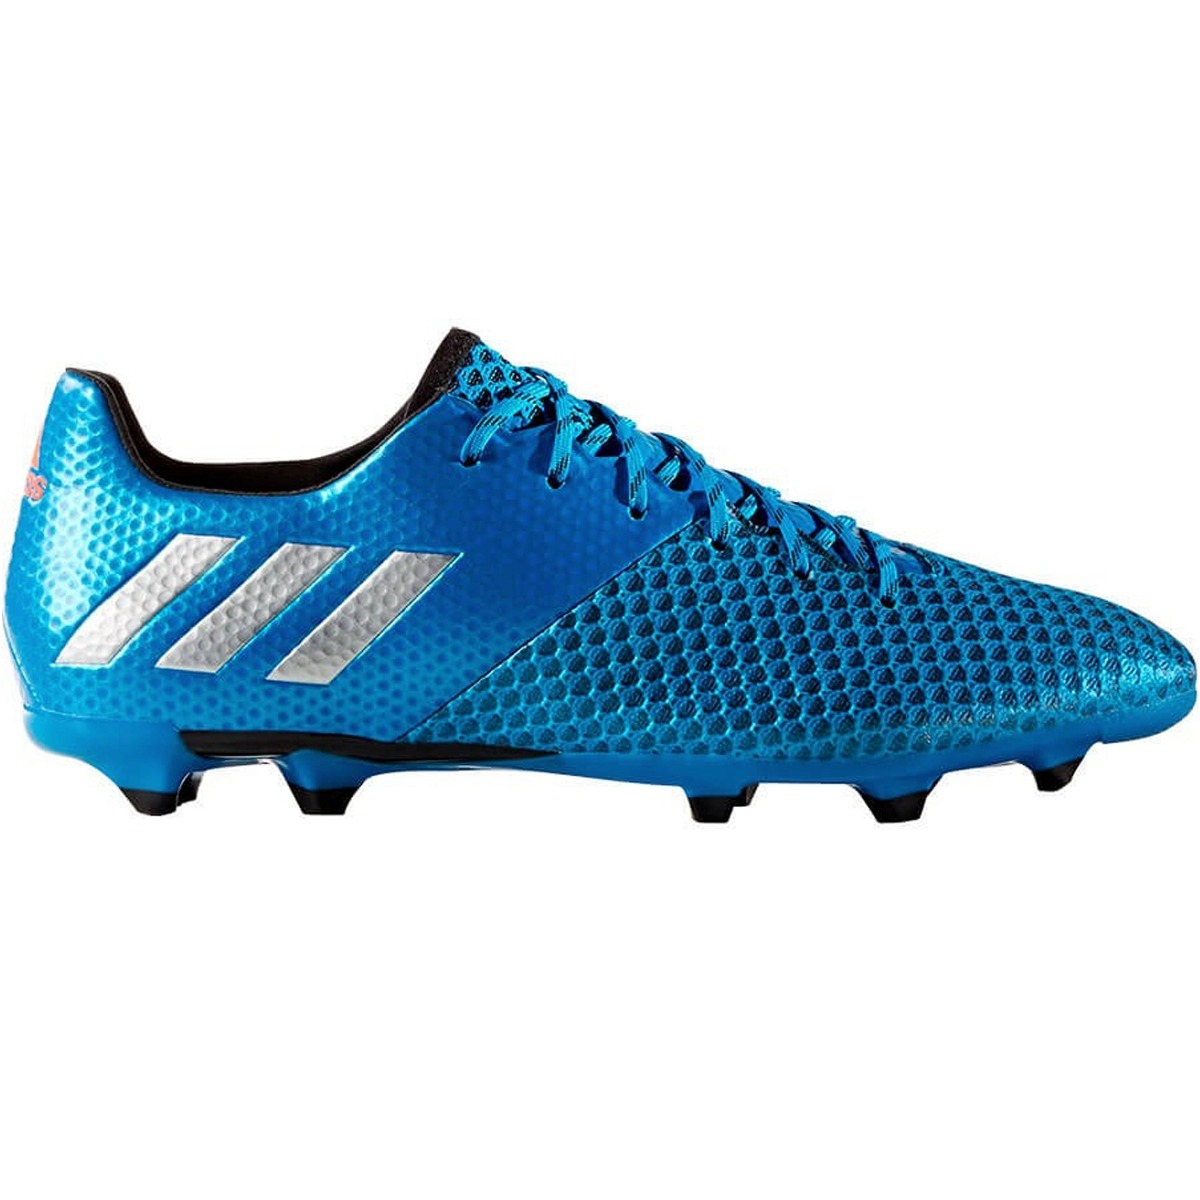 Adidas Zapatos Futbol Semiprofesionales Messi 2 16 Aq3111 hQdrtCs